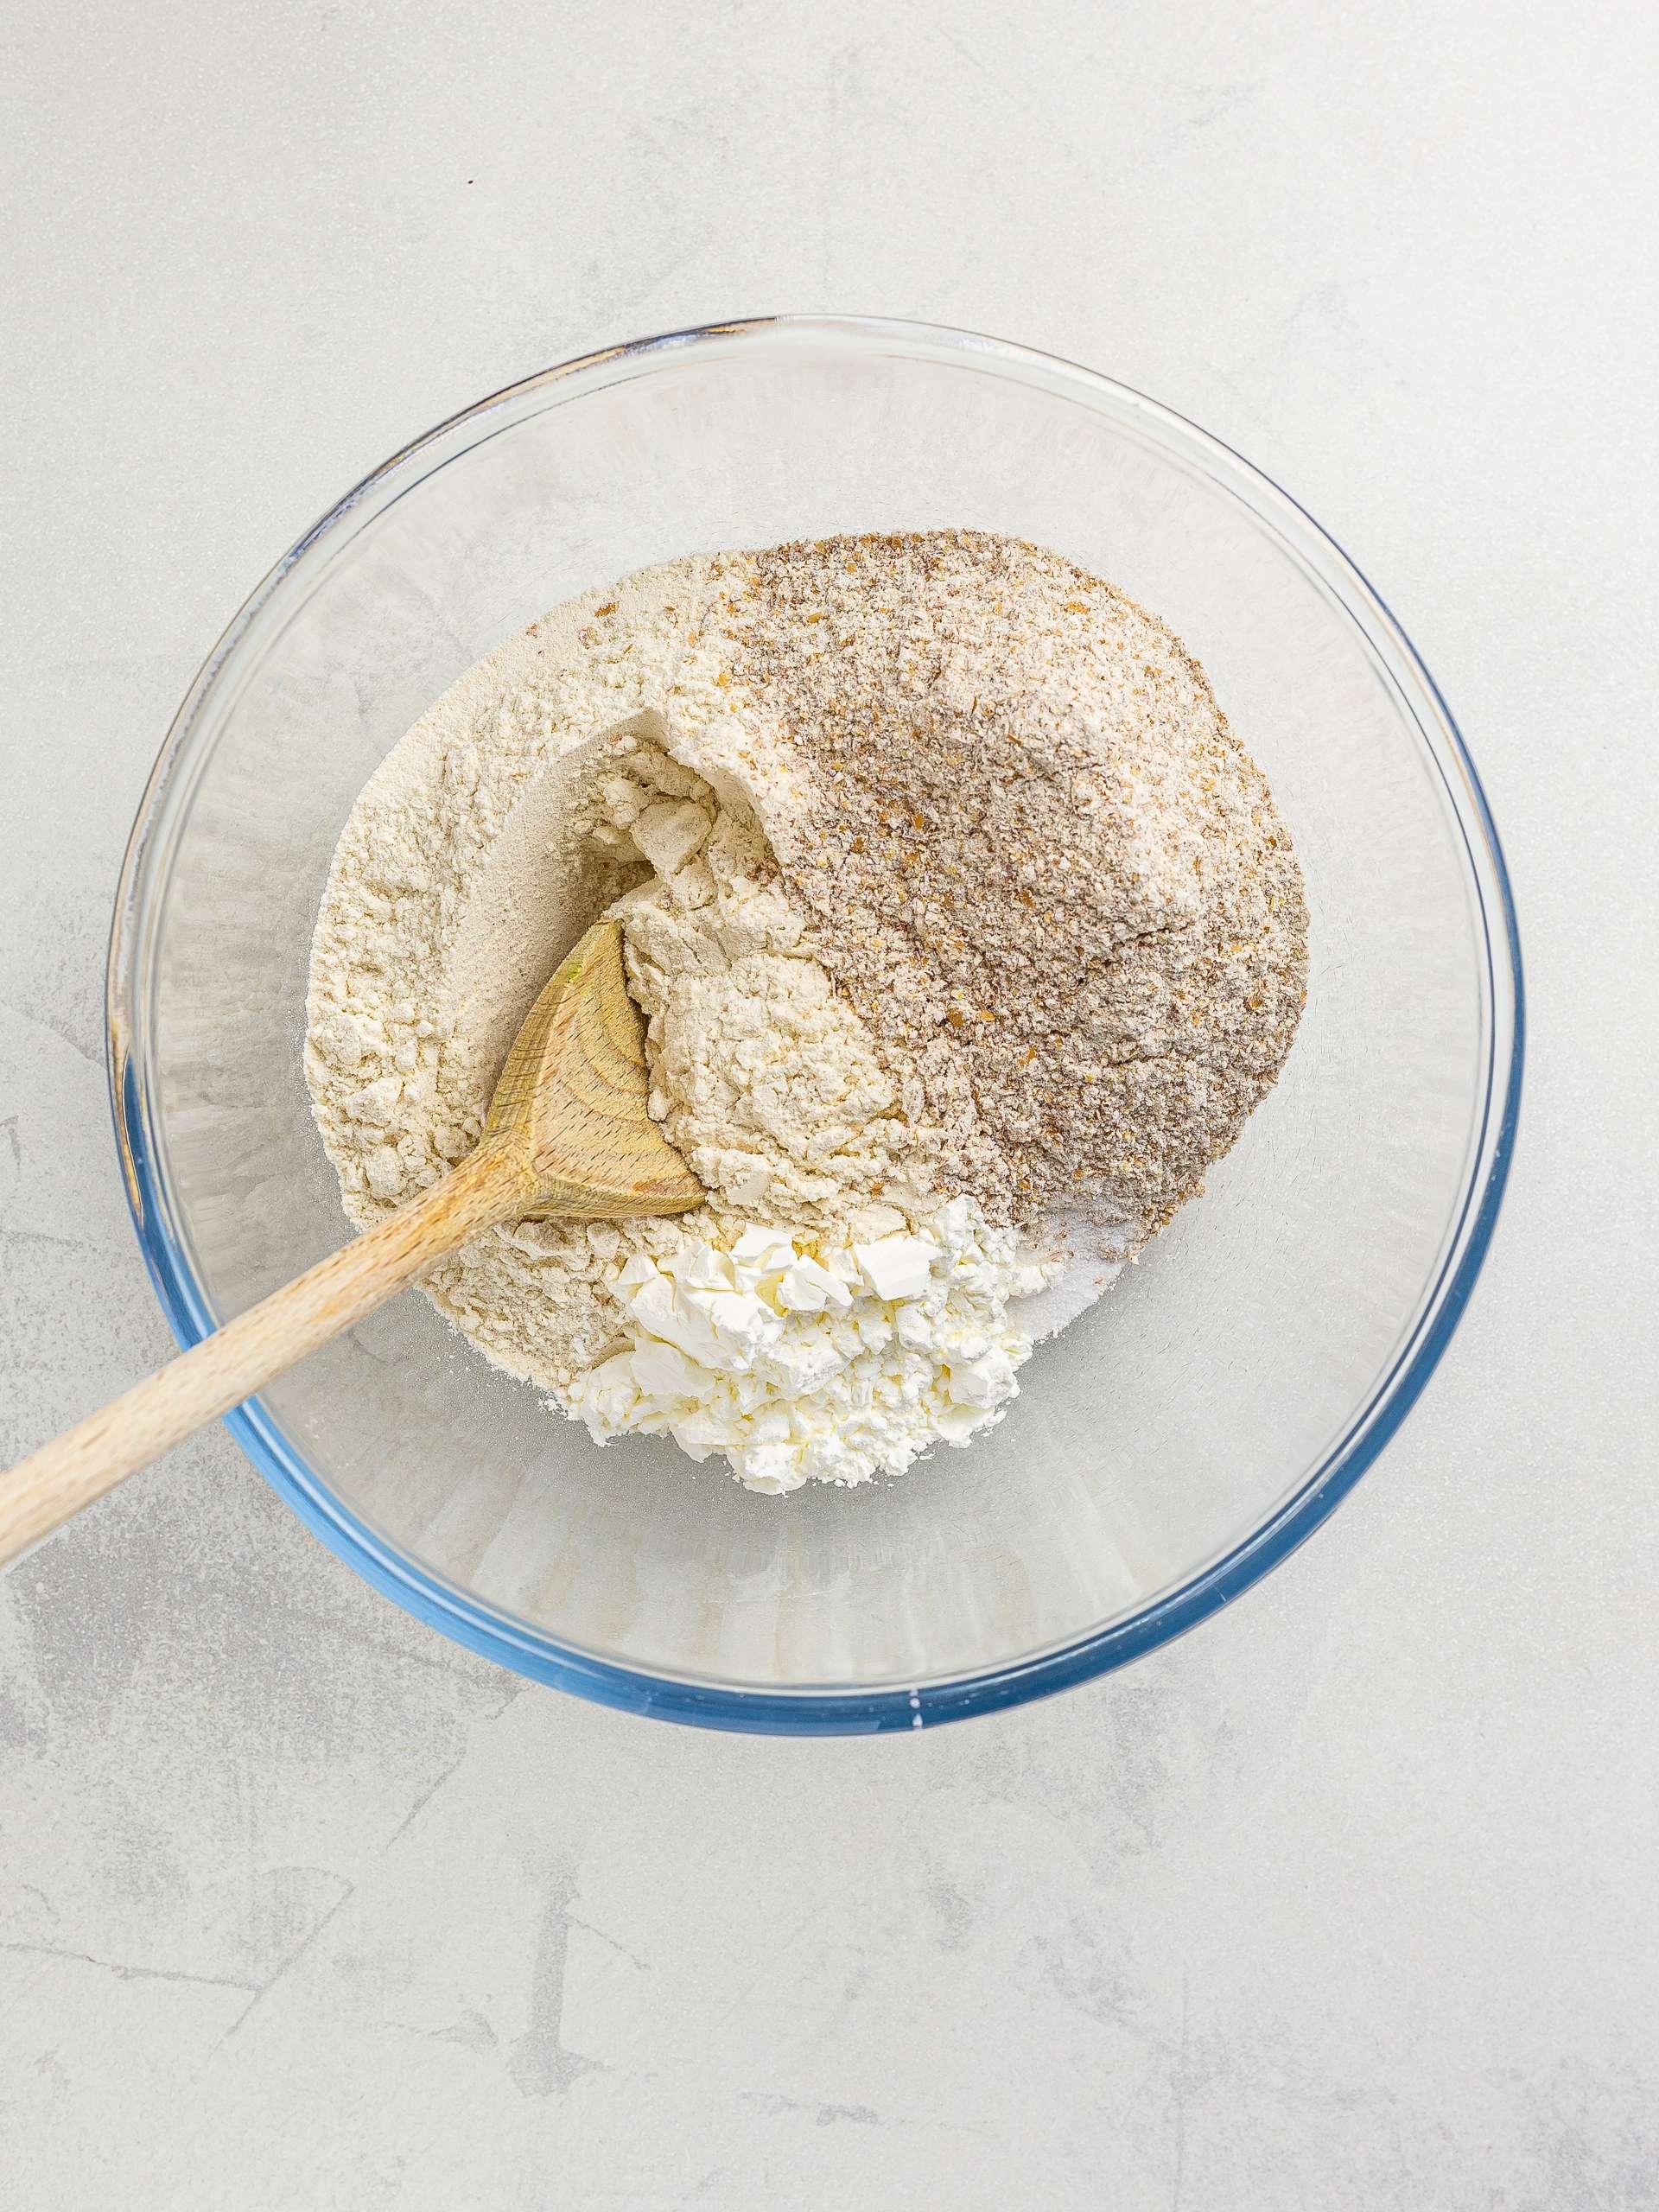 krantz cake dough ingredients